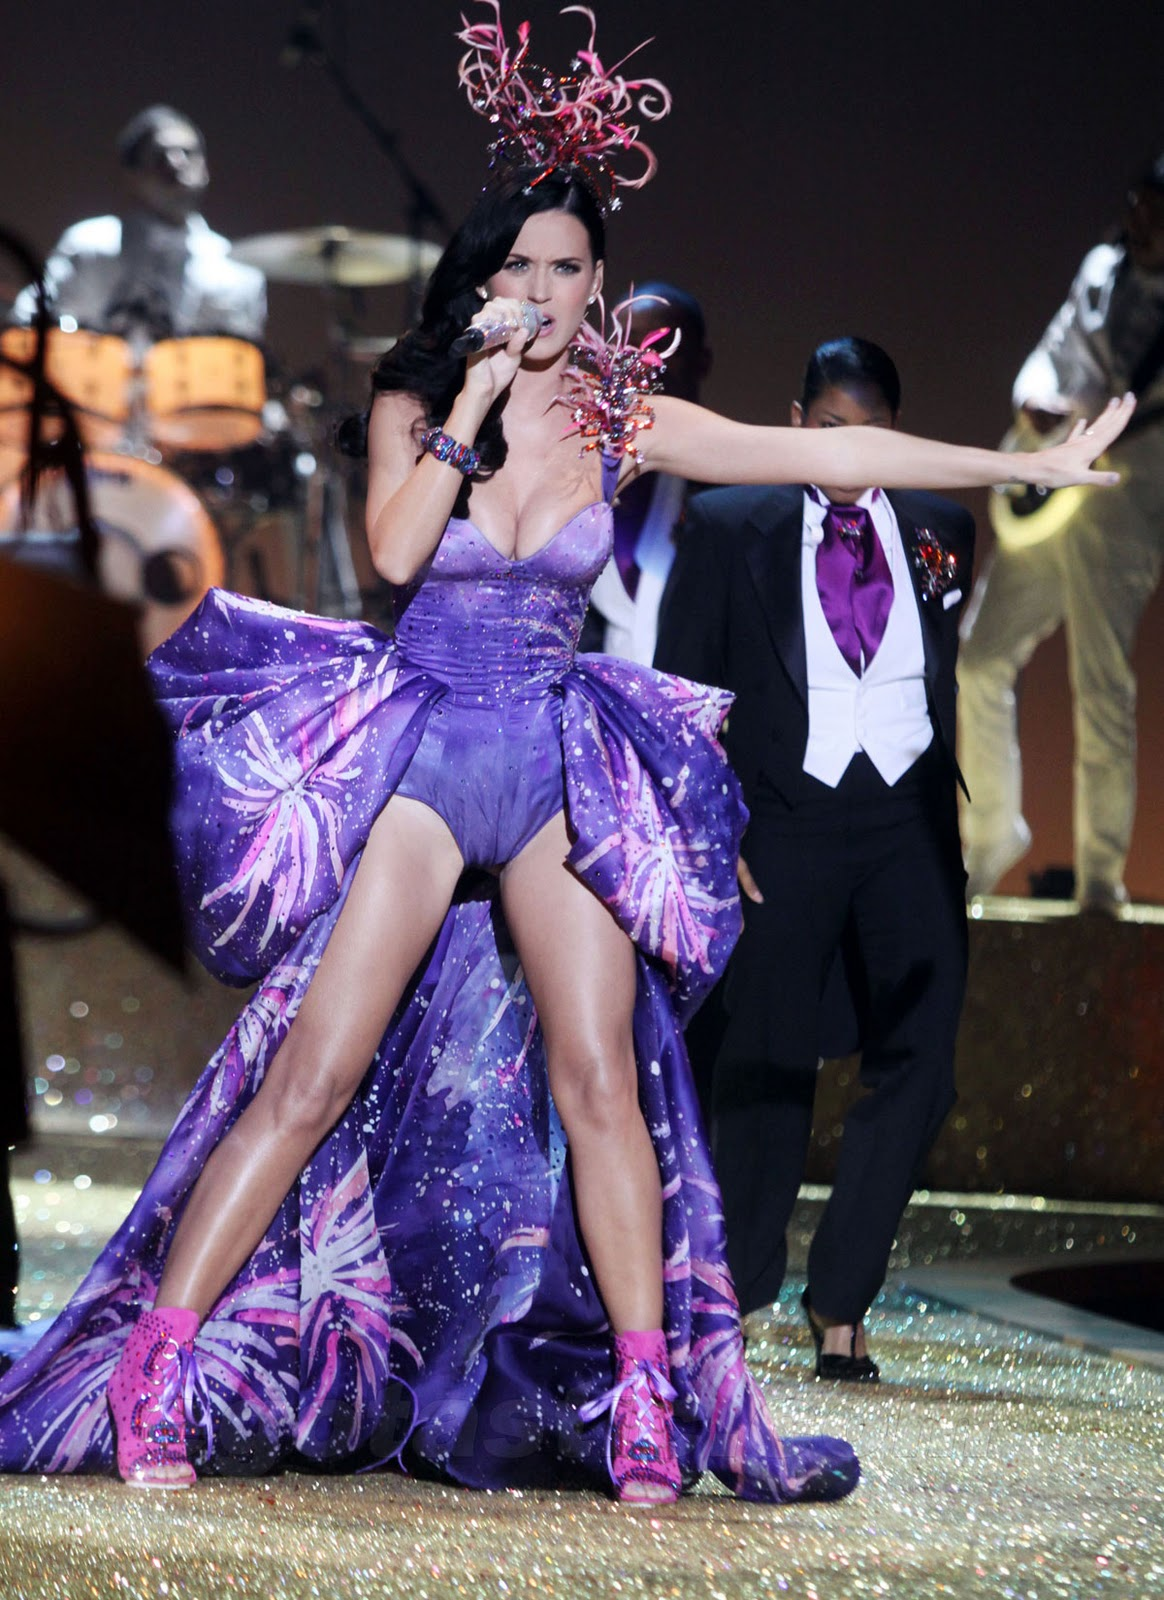 http://1.bp.blogspot.com/_WDCWEjl45FQ/TS82pSFuASI/AAAAAAAACX8/vf928-9SioQ/s1600/katy-perry-2010-victorias-secret-fashion-show-12-FP-6038990.jpg